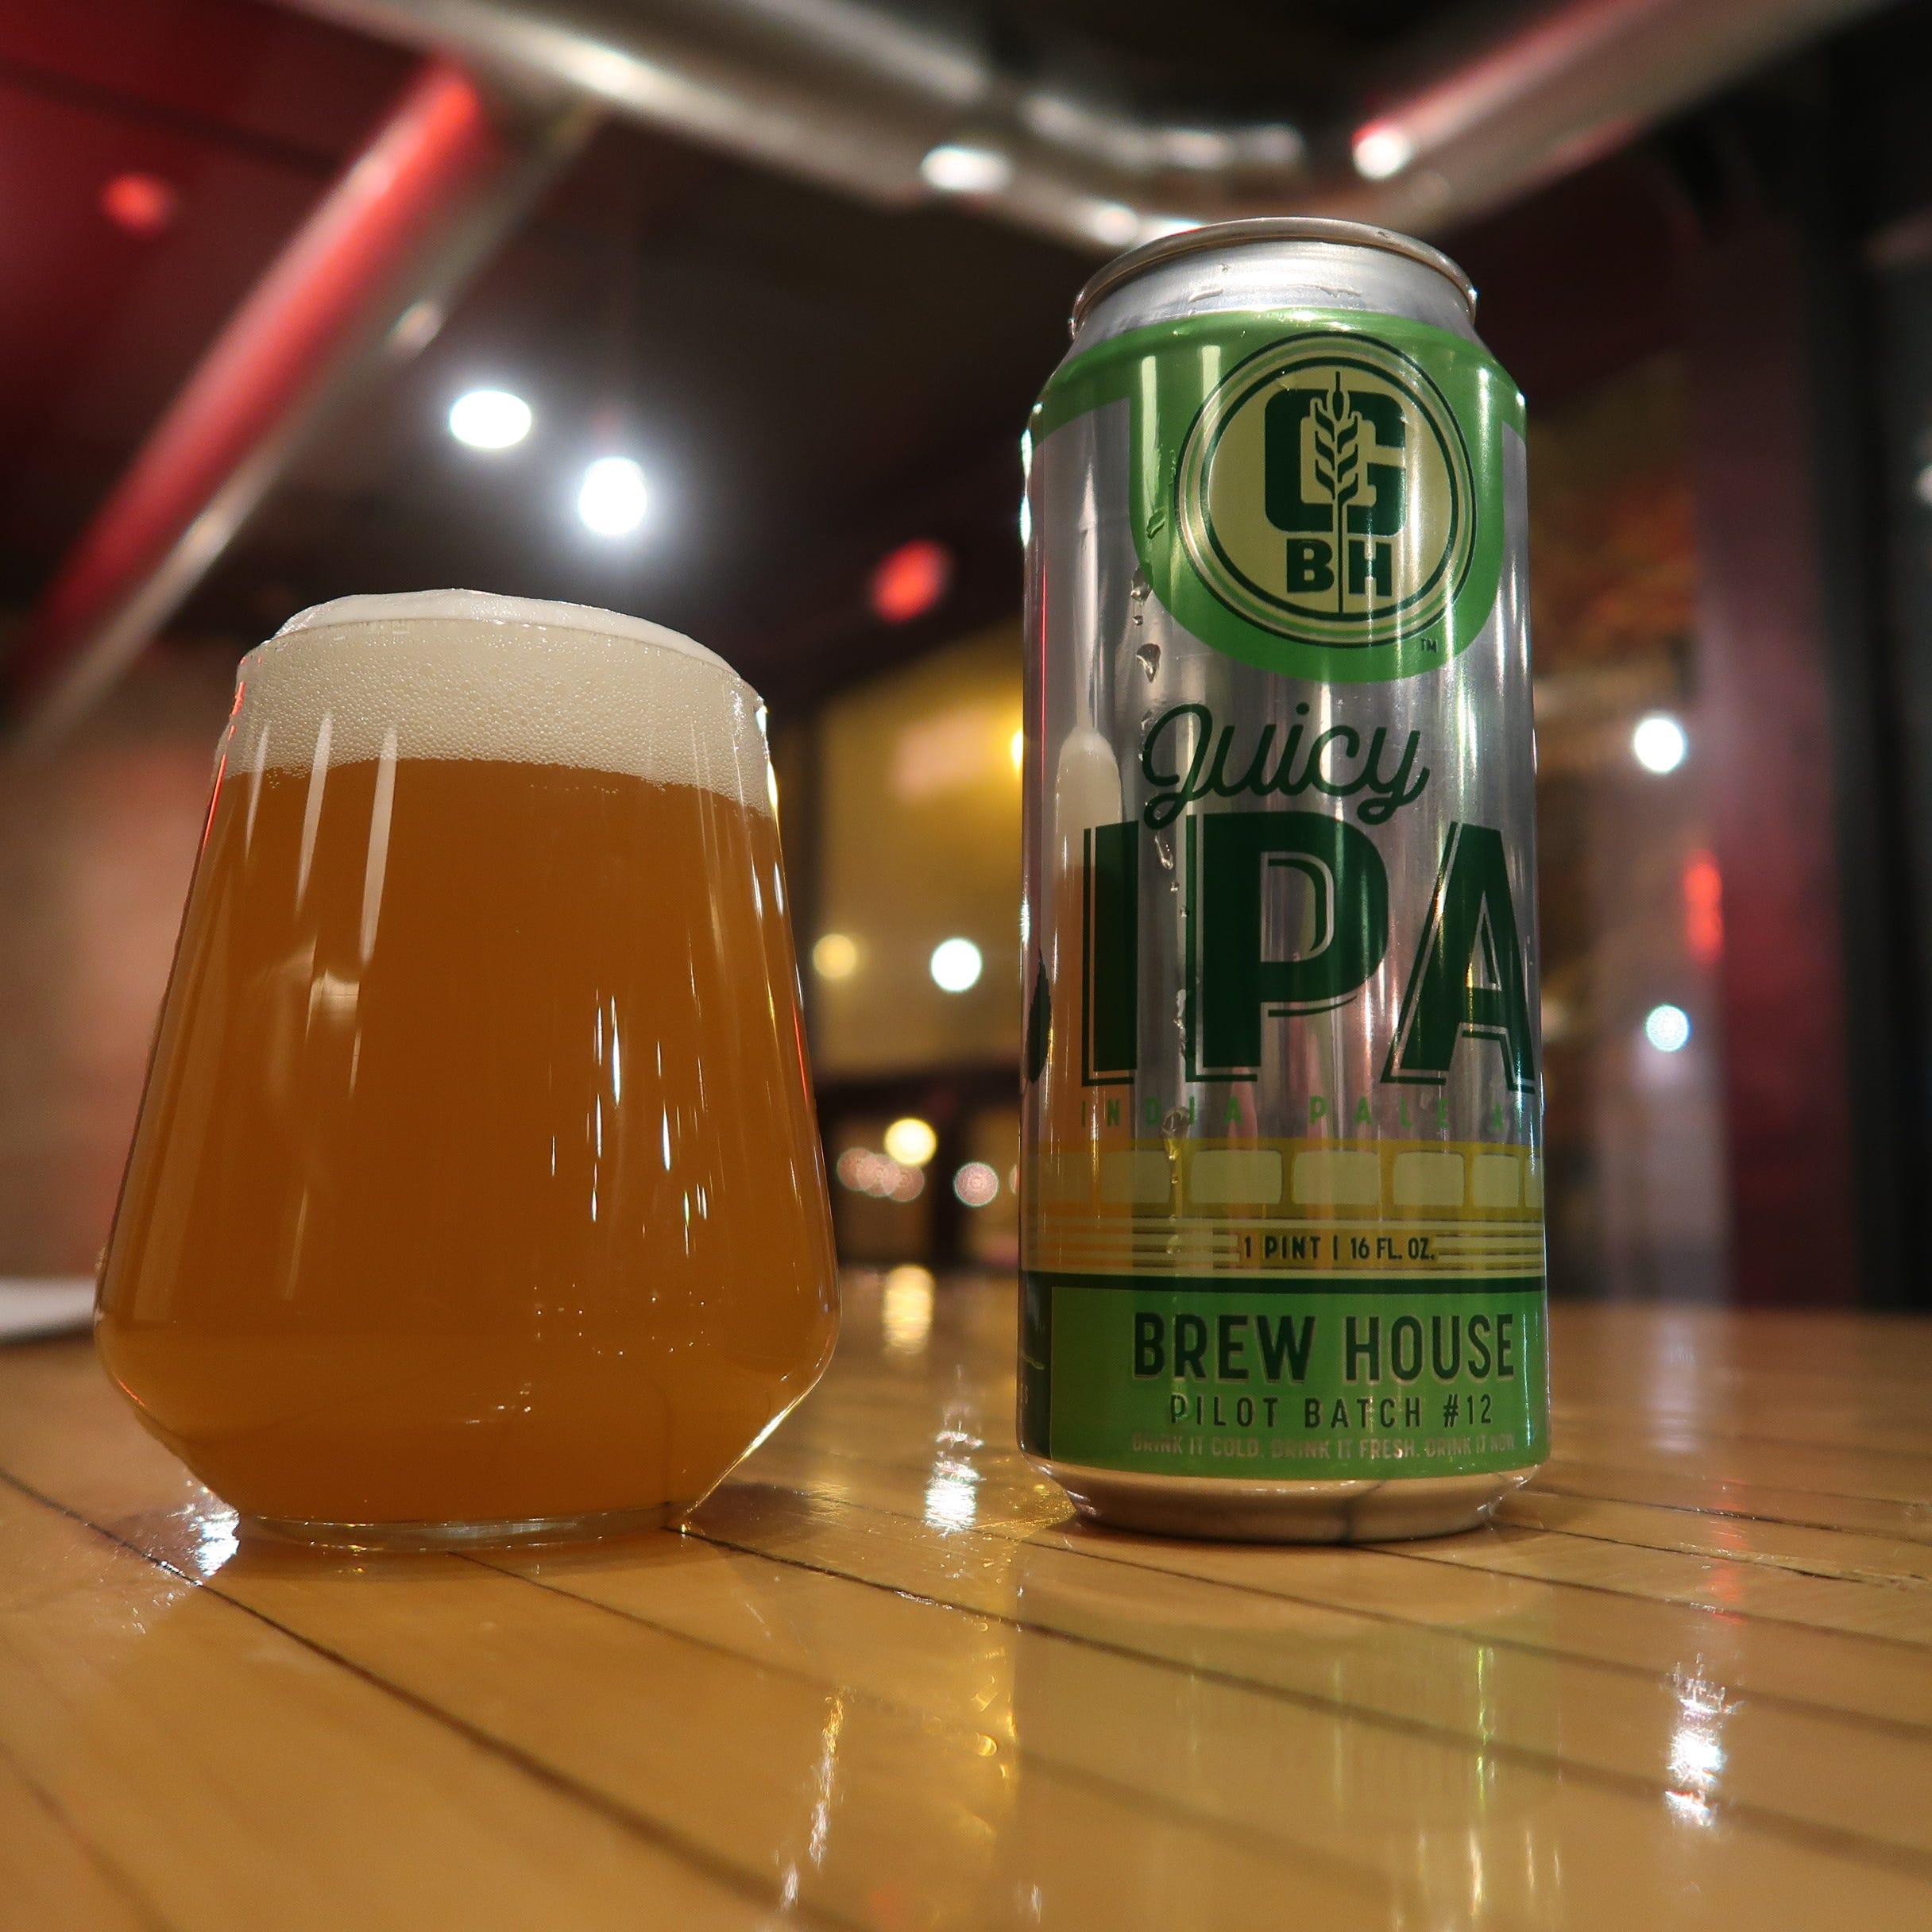 How Genesee Brewery finally got the juicy in its Juicy IPA